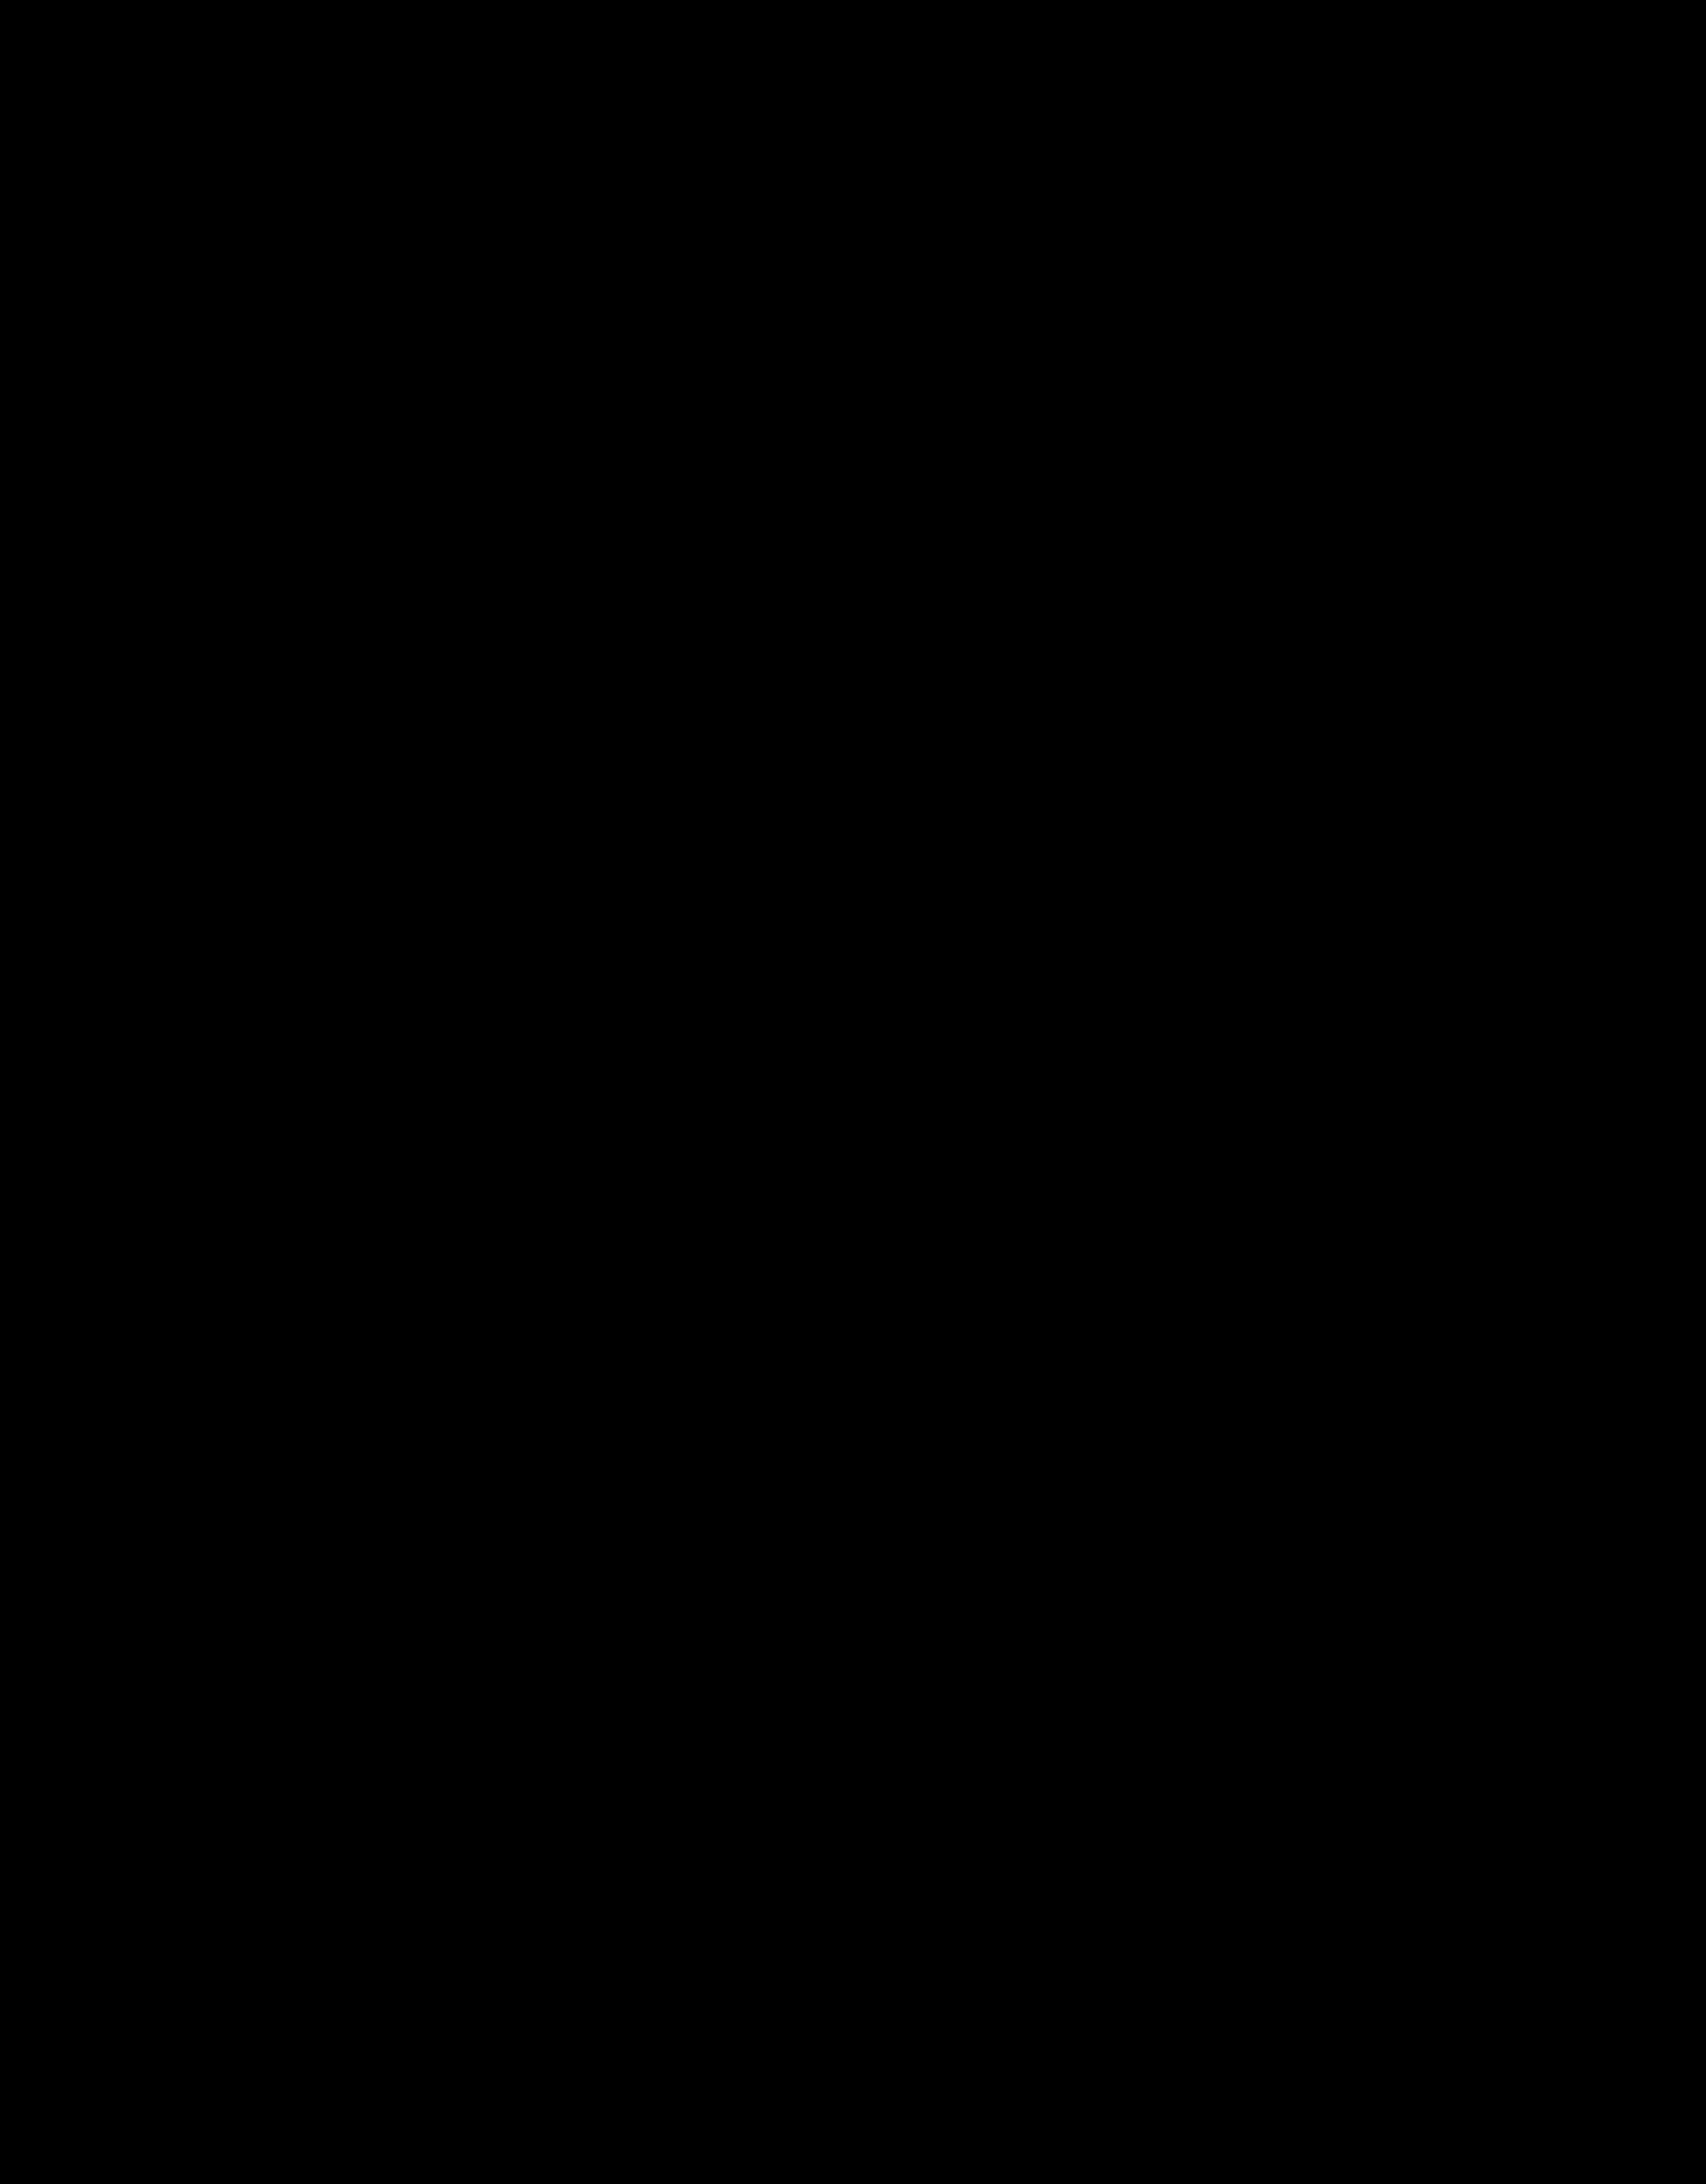 Clipart Edit Icon